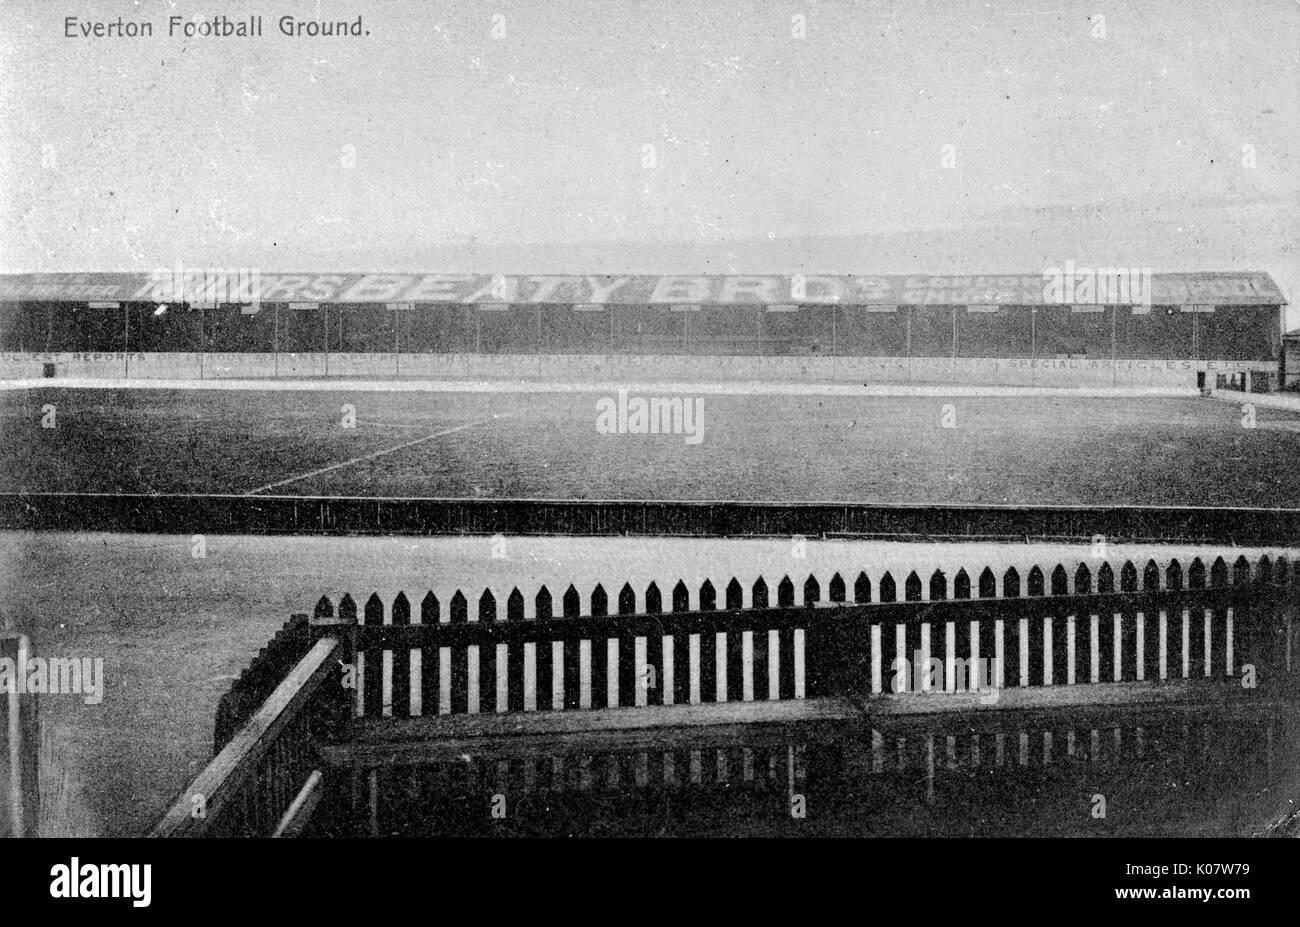 Everton football ground, Liverpool.      Date: circa 1910 Stock Photo